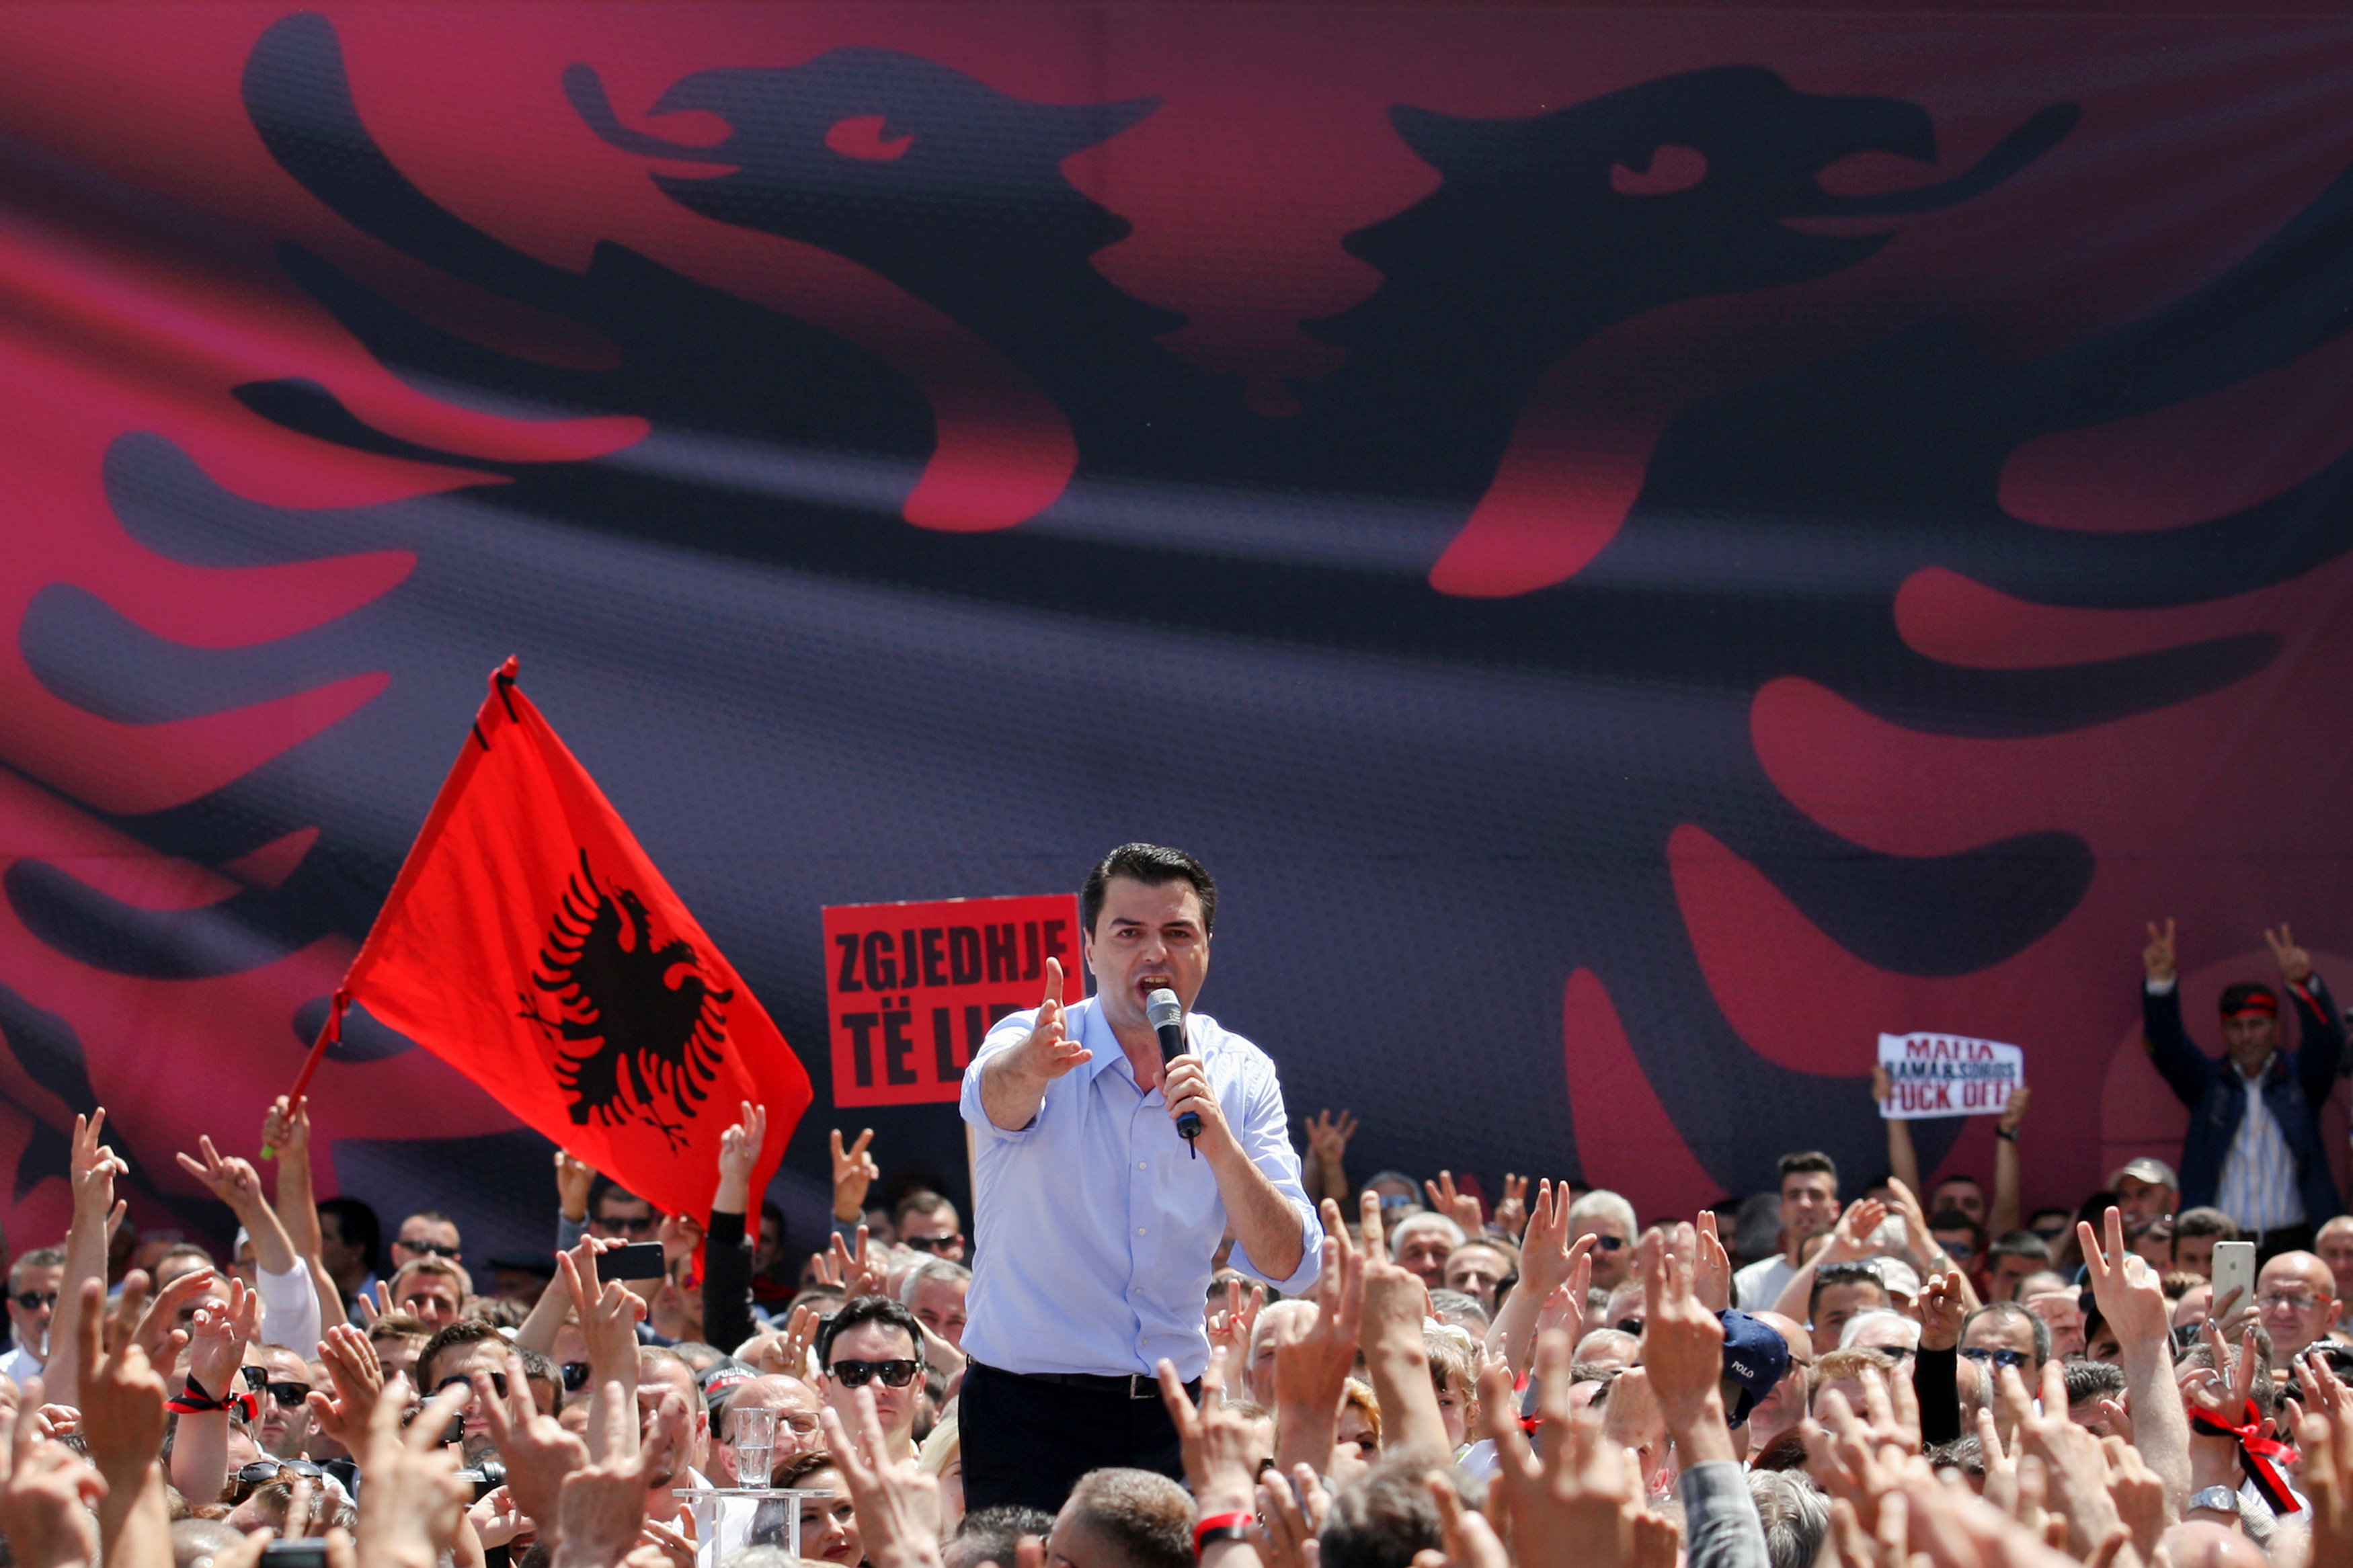 2017 05 13T150838Z 1775889483 RC14D06B3000 RTRMADP 3 ALBANIA PROTEST copy